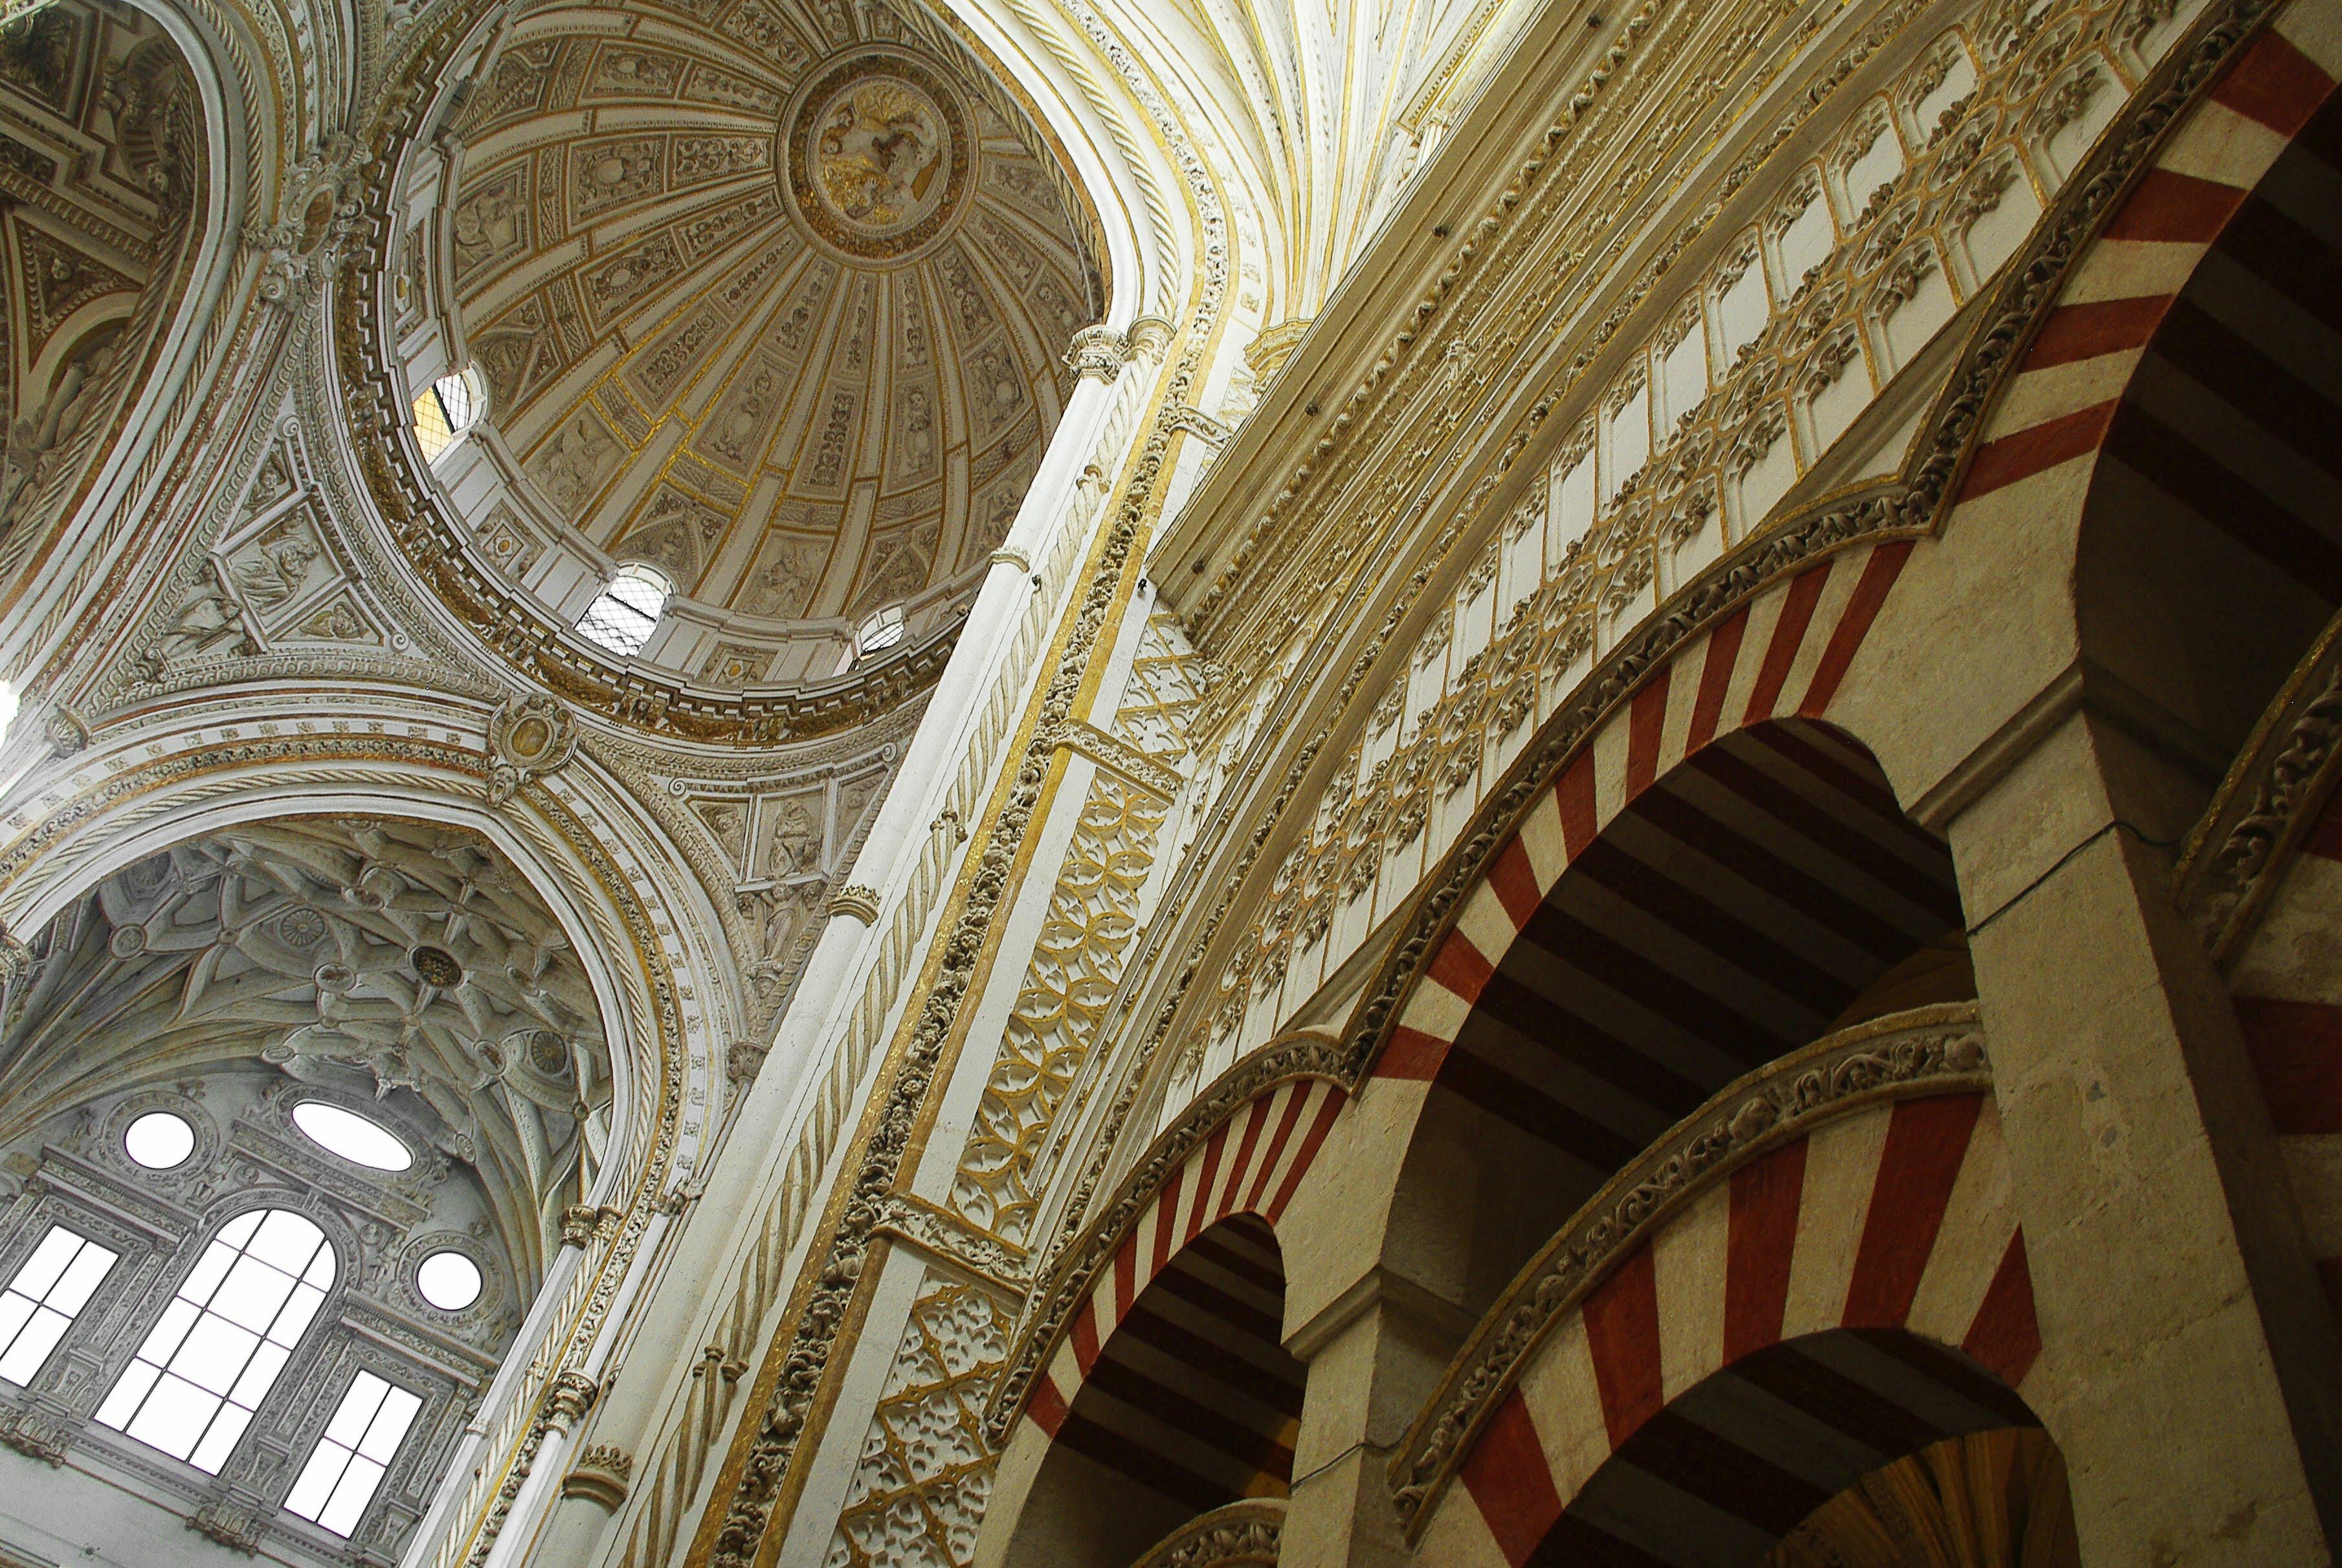 Spain cordoba Mezquita cathedral chris bladon